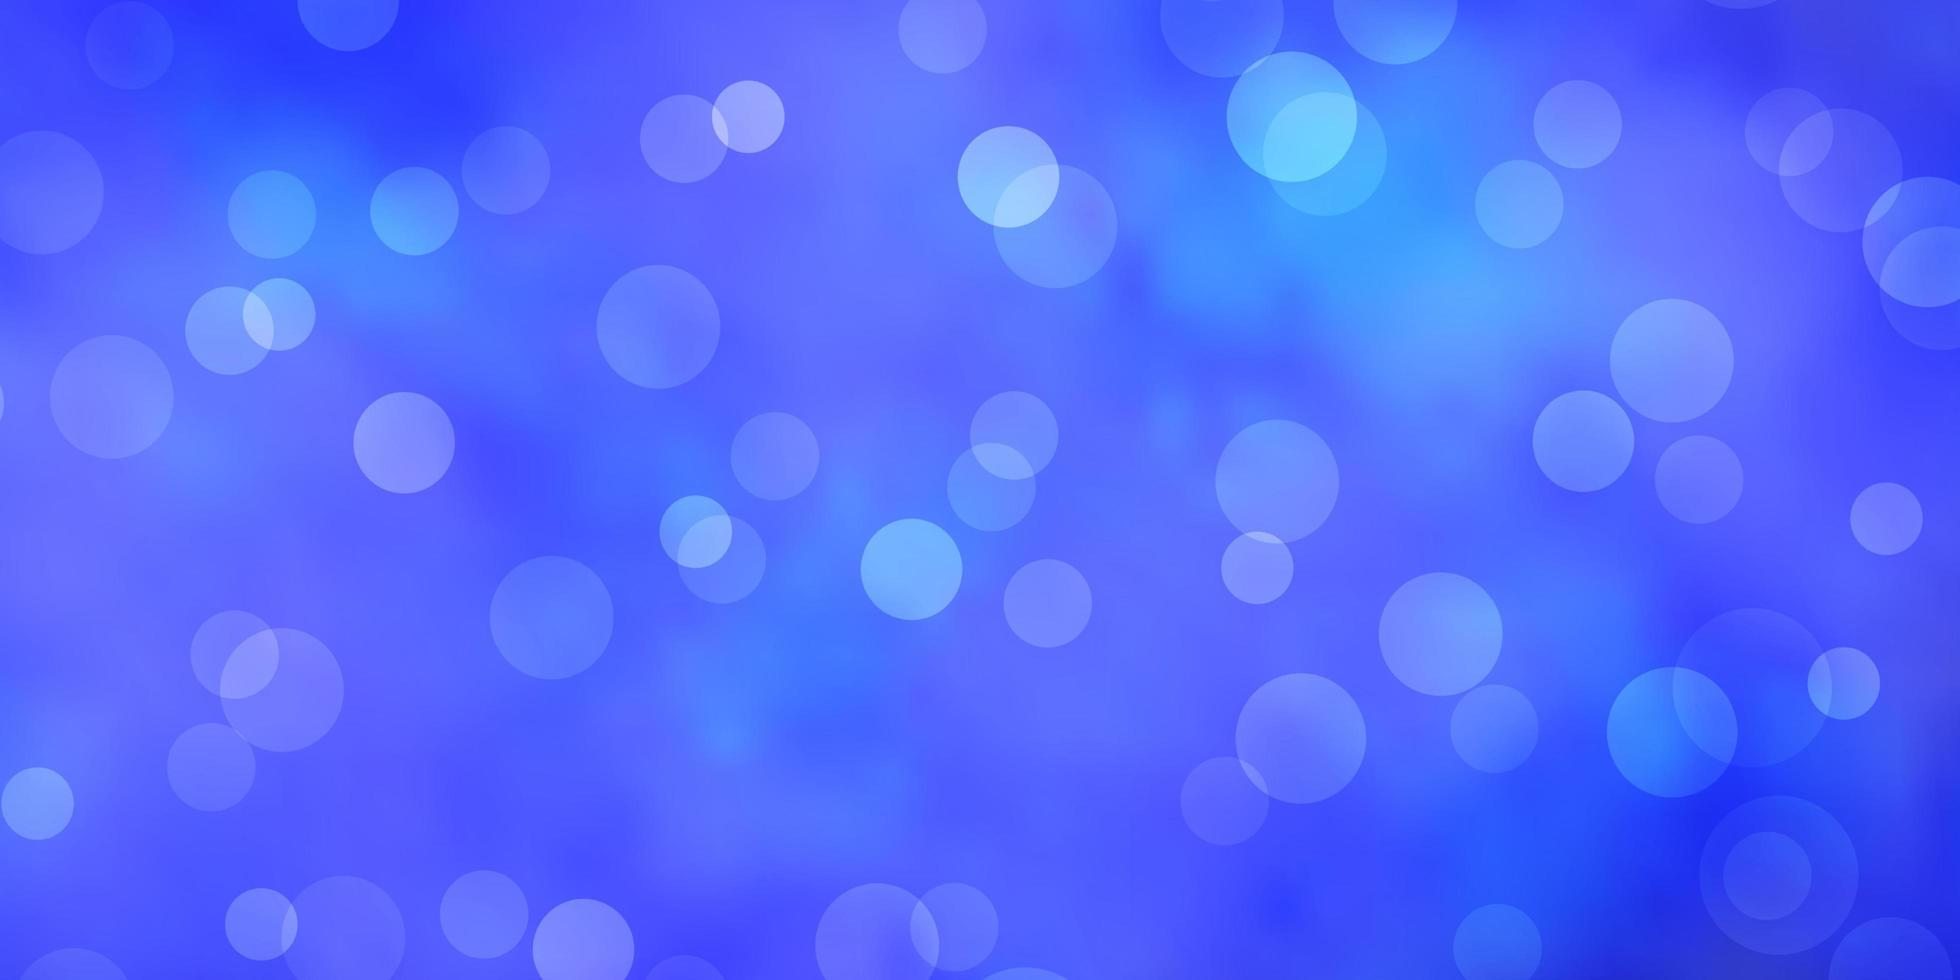 hellblaue Vektorschablone mit Kreisen vektor